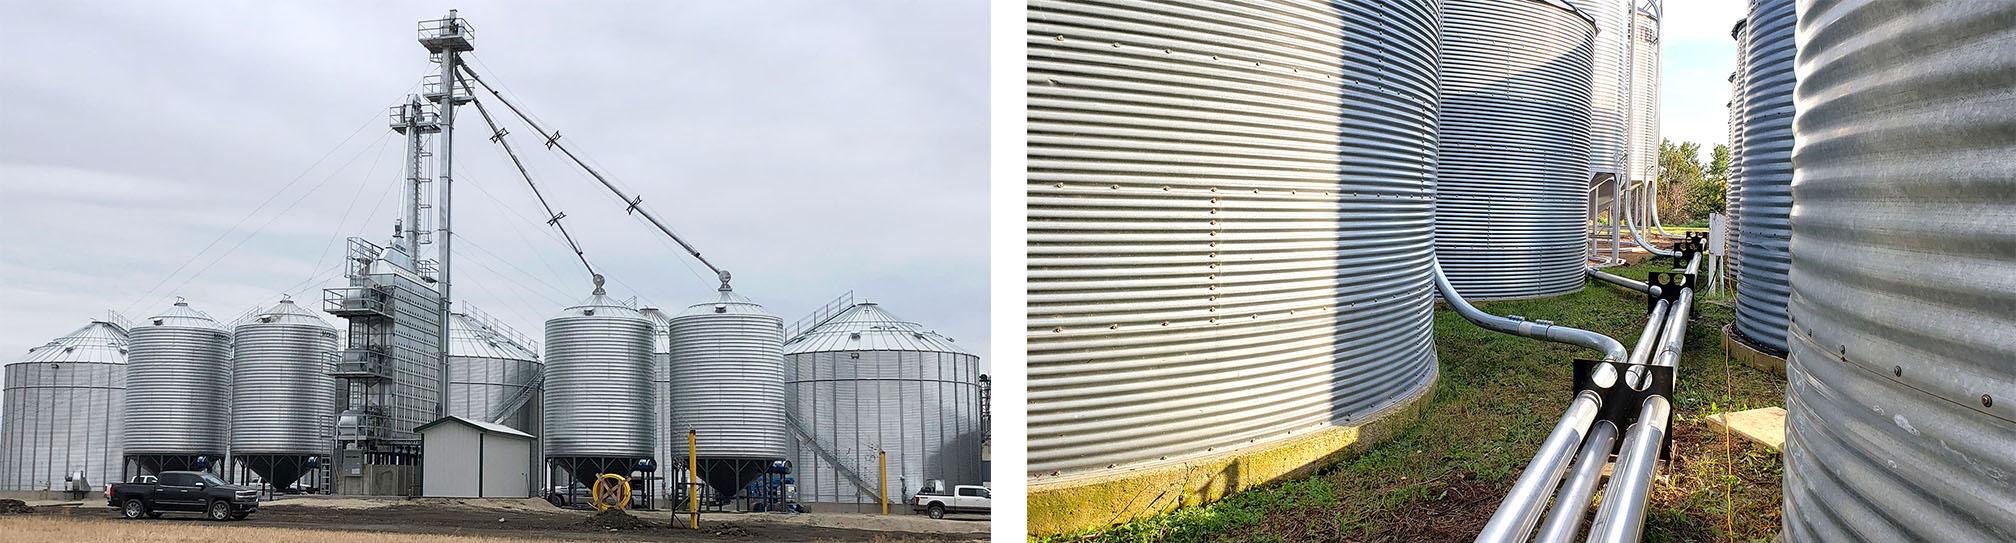 Bin Site with NECO Grain Dryer & Bucket Elevators / Walinga Pipe, Distributor